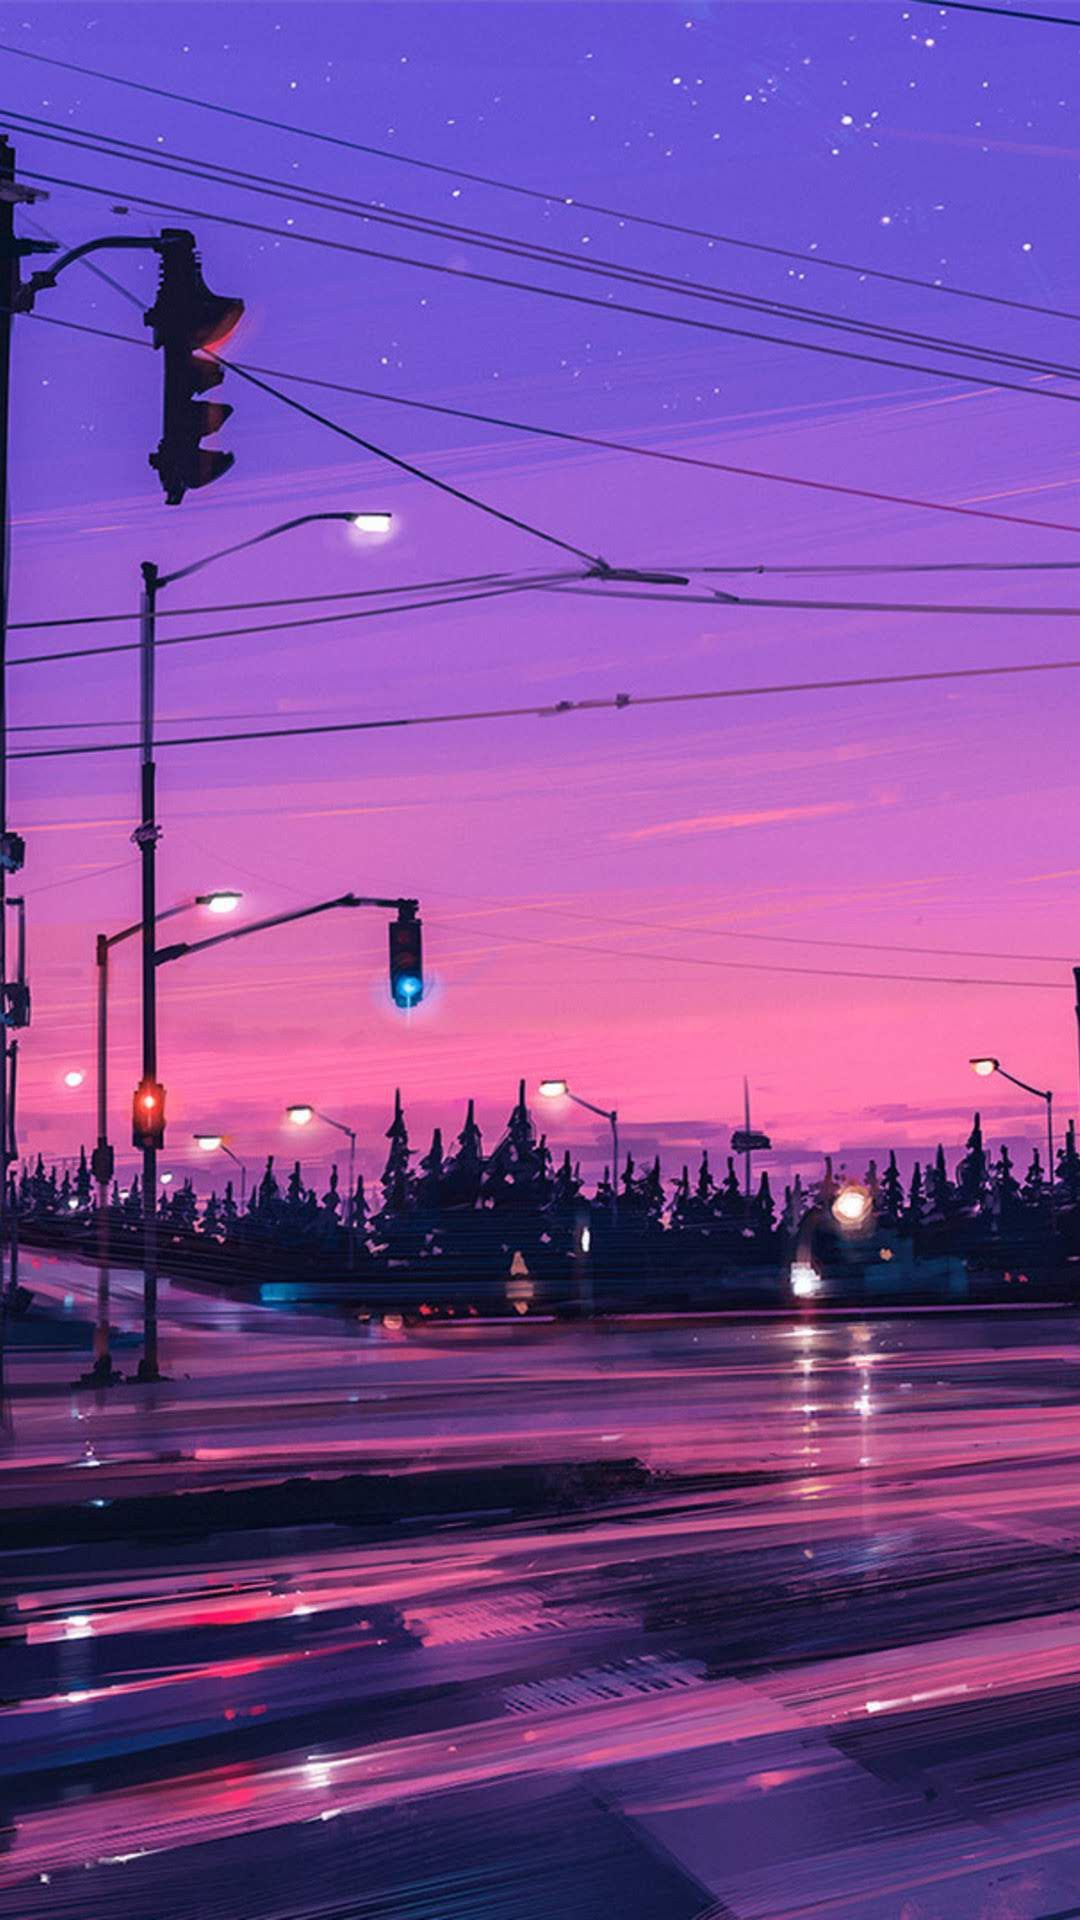 Rainy Street Lights Painting Wallpaper Available In Wallpixel App Desktop Wallpaper Art Landscape Wallpaper Scenery Wallpaper